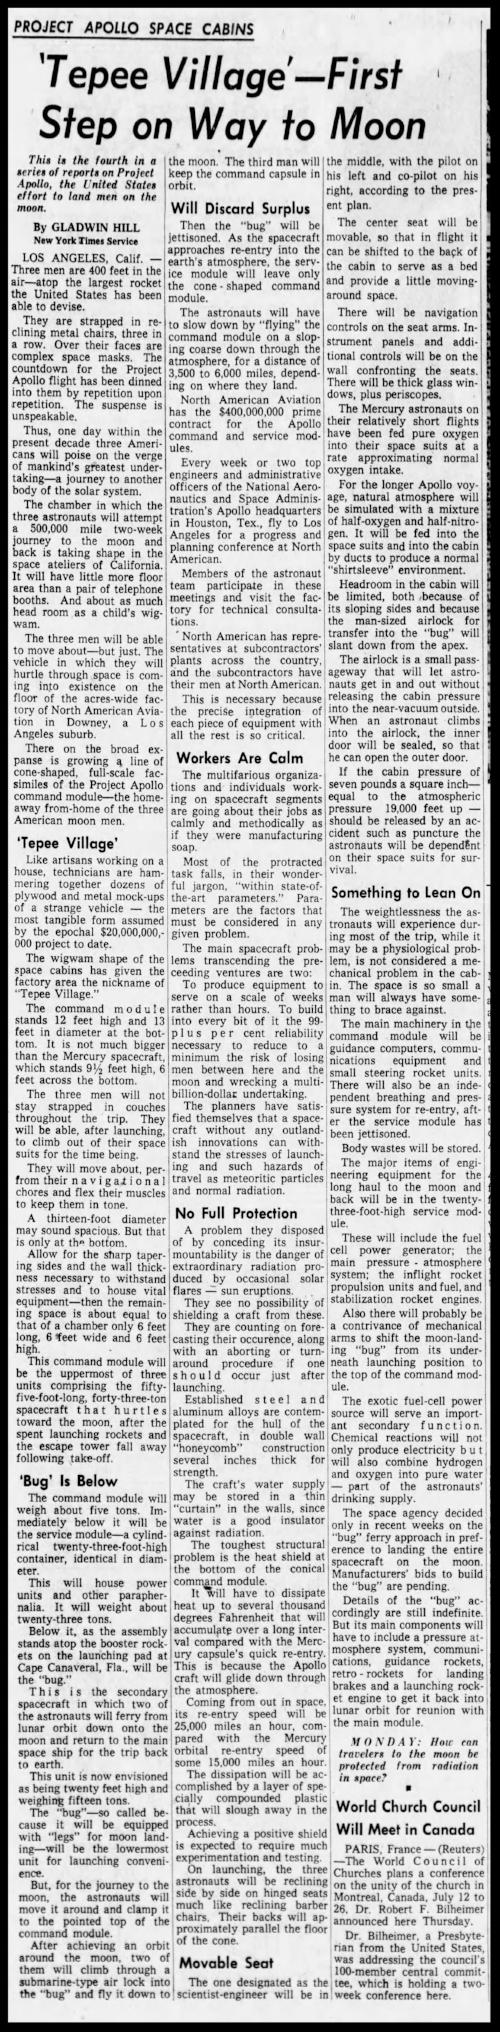 Above- Star Tribune Fri Aug 10 1962